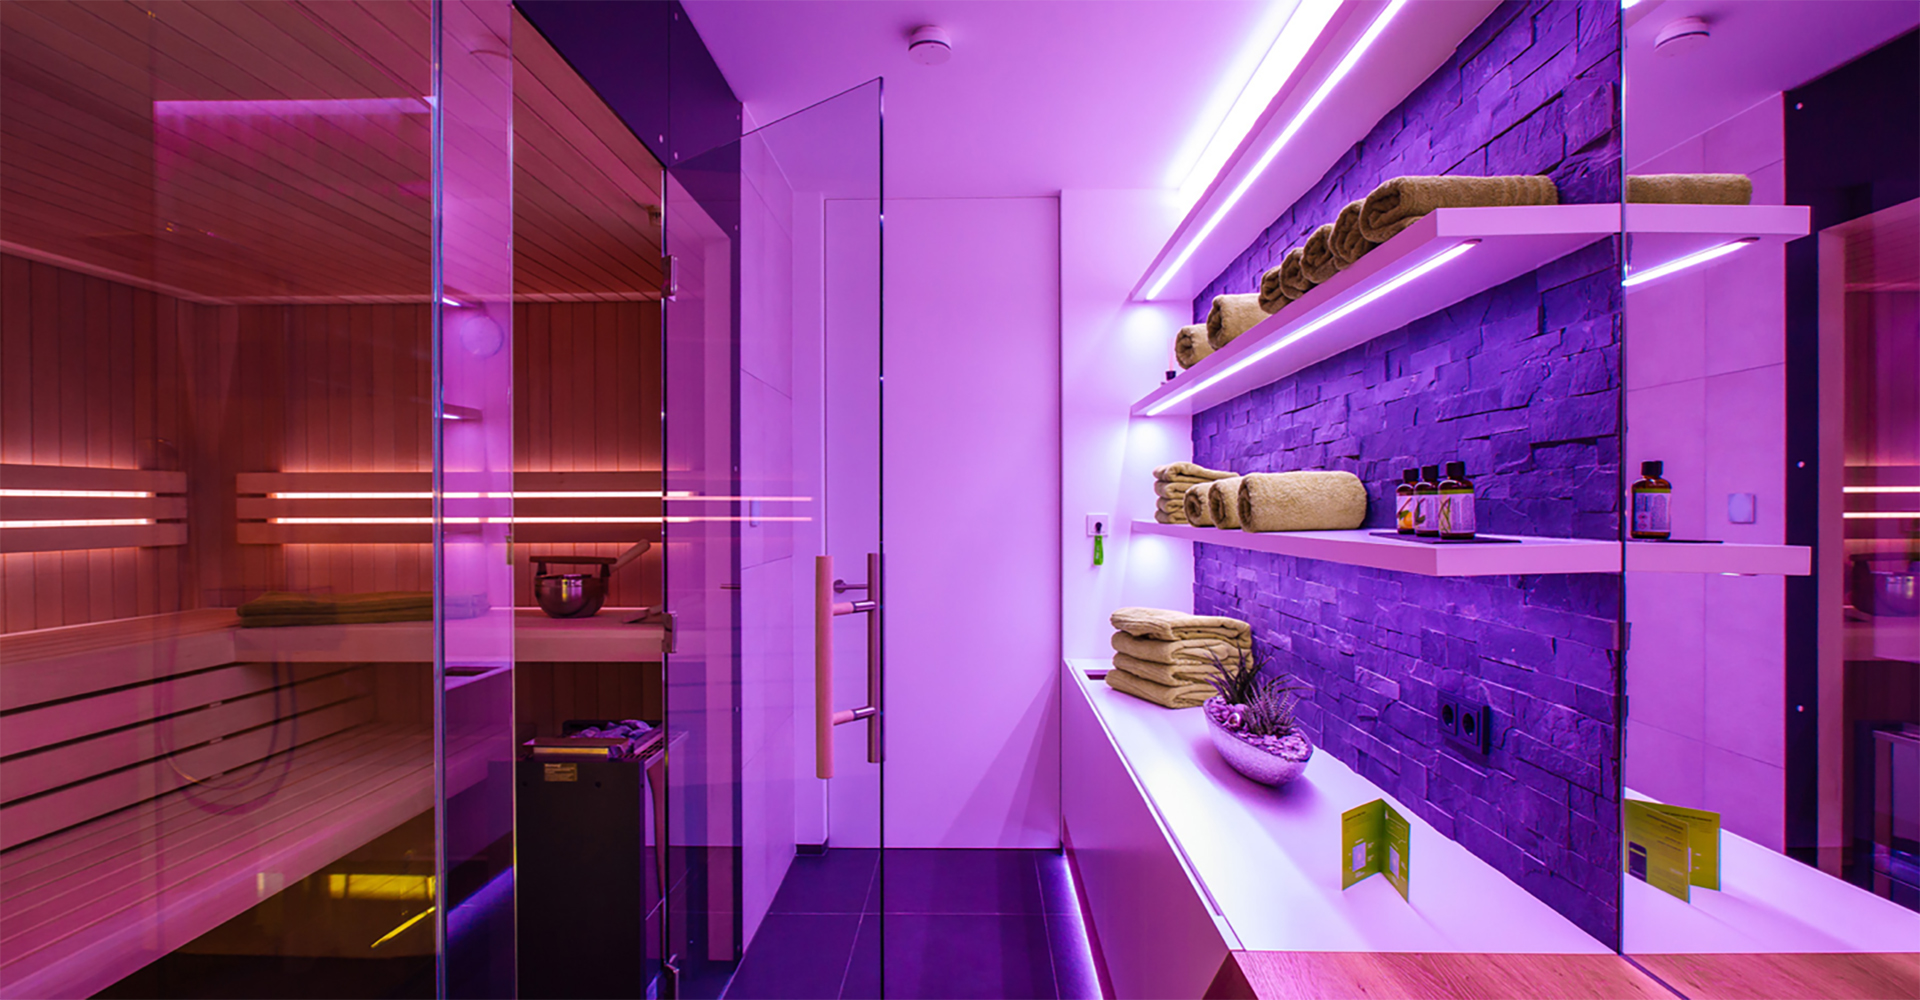 FS-showhome-sauna-pink.jpg